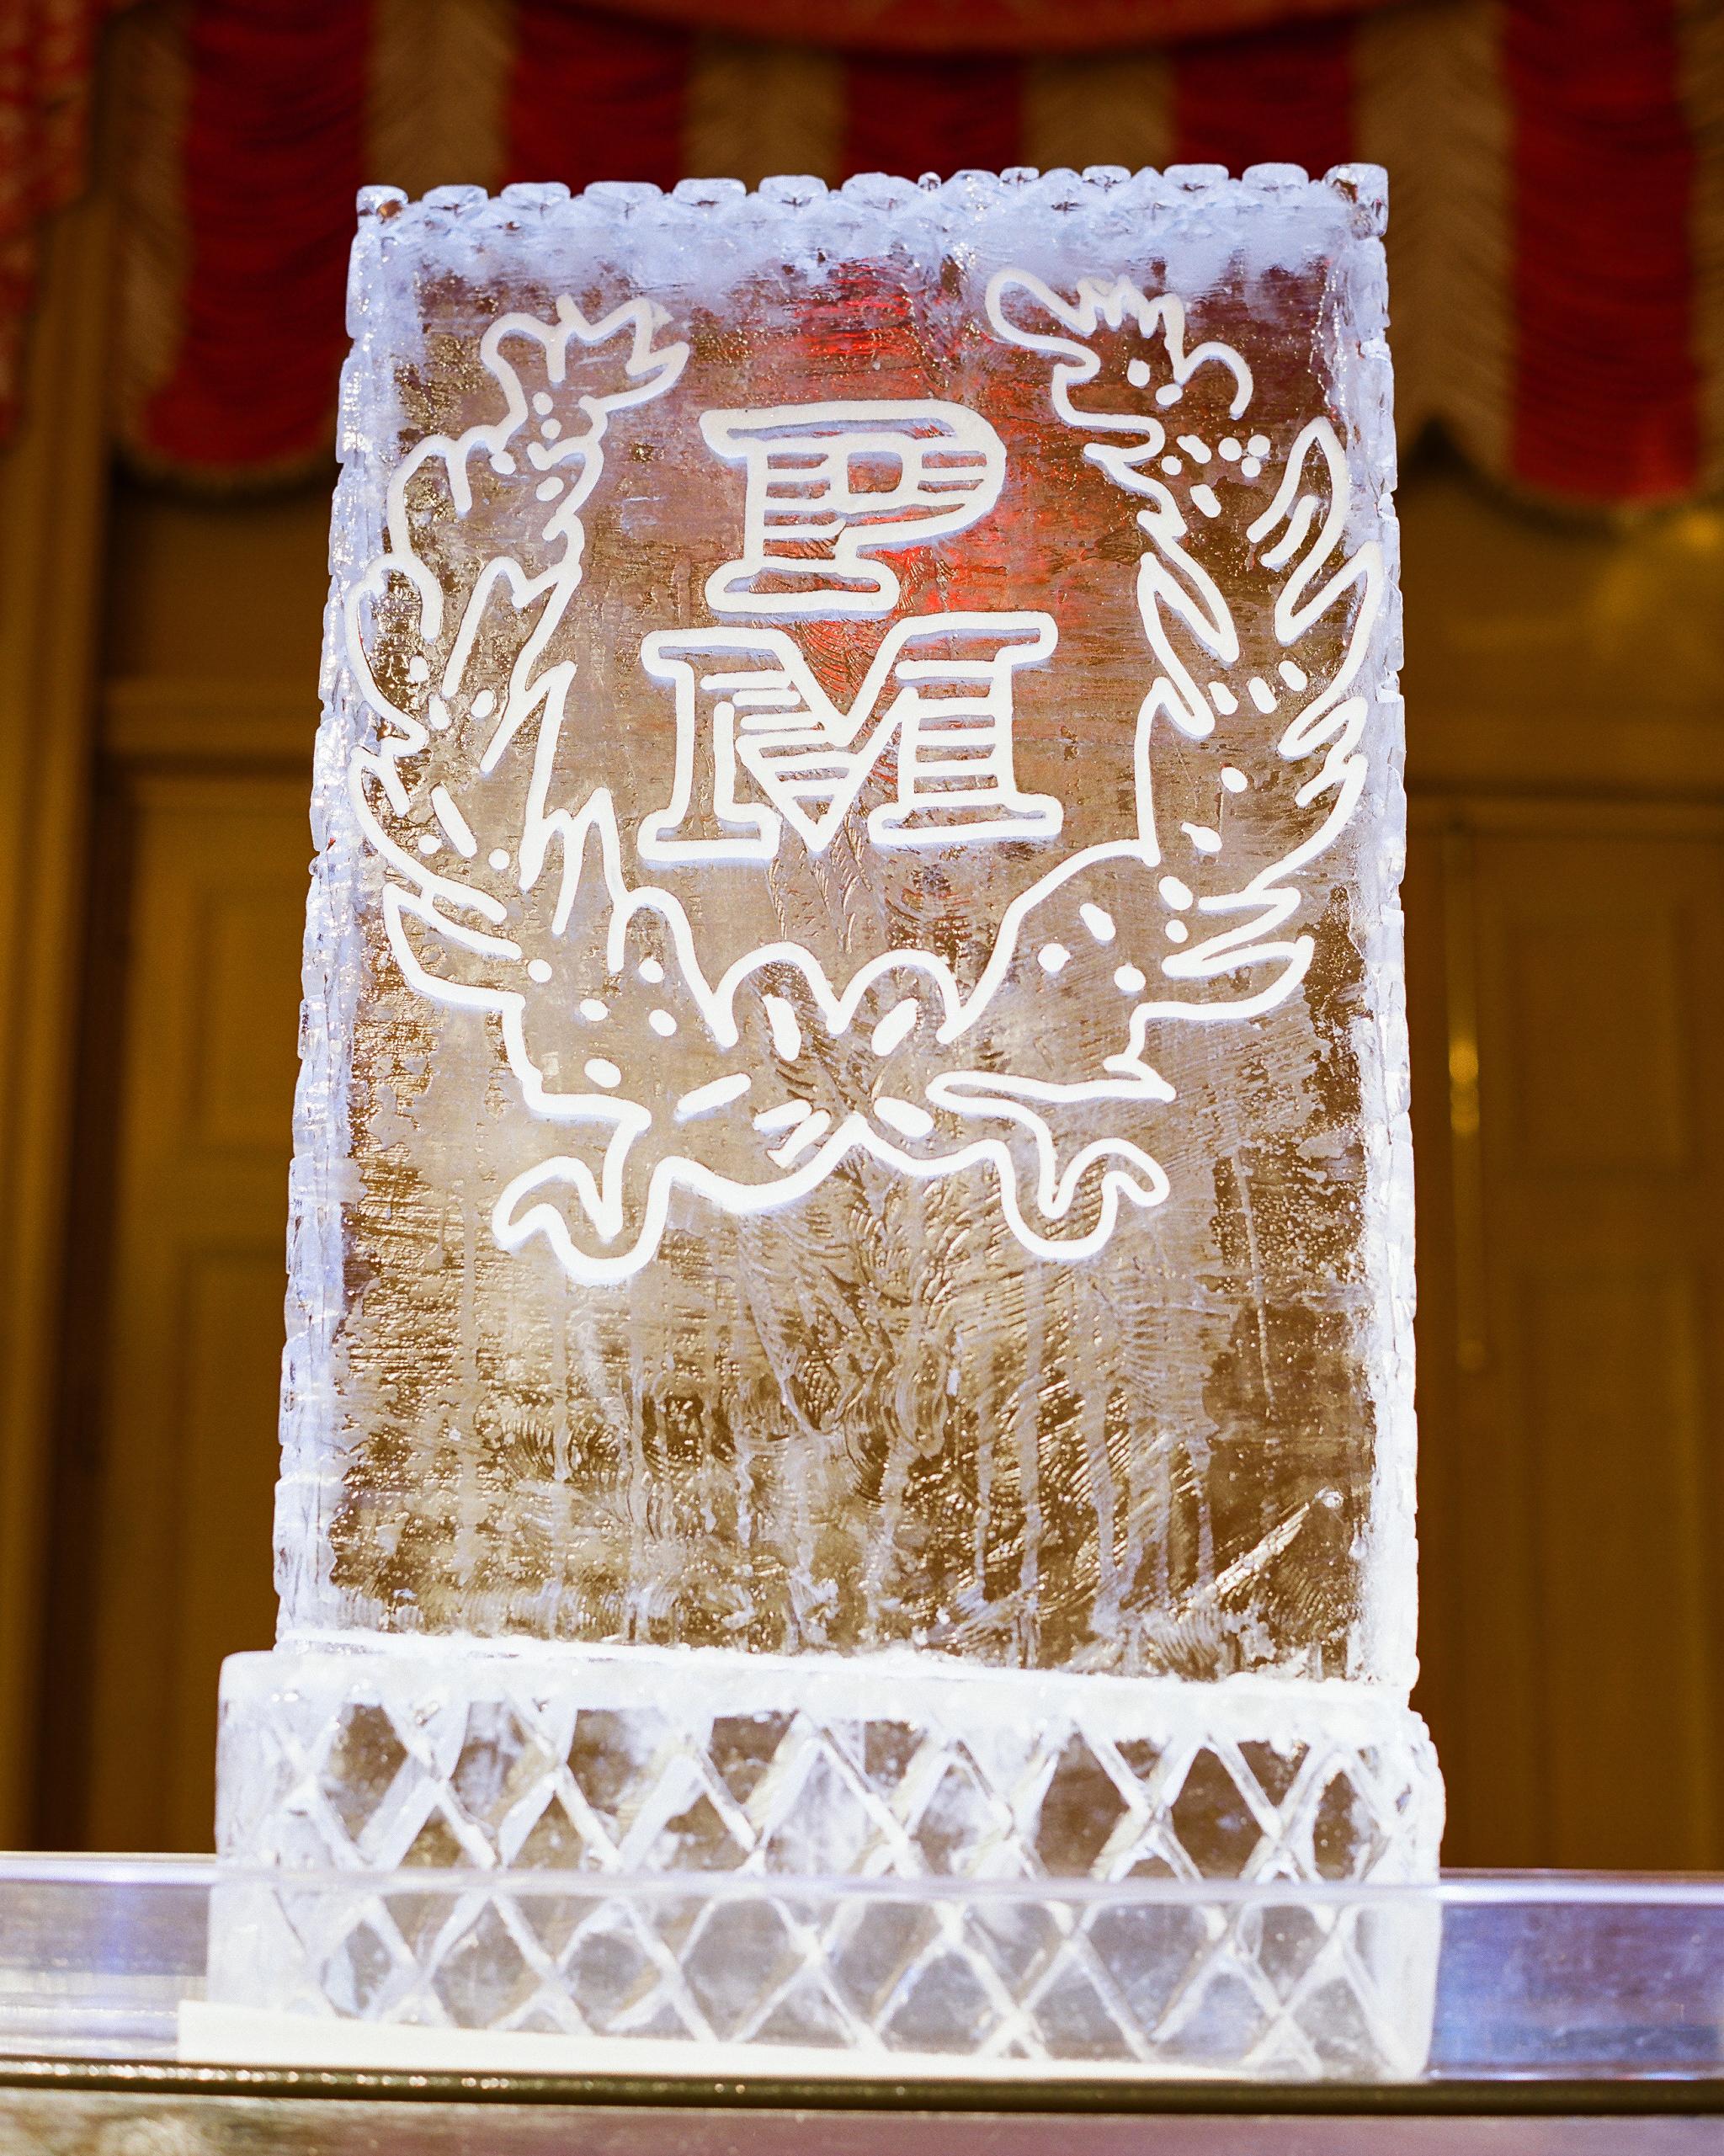 paige-michael-wedding-icesculpture-0960-s112431-1215.jpg